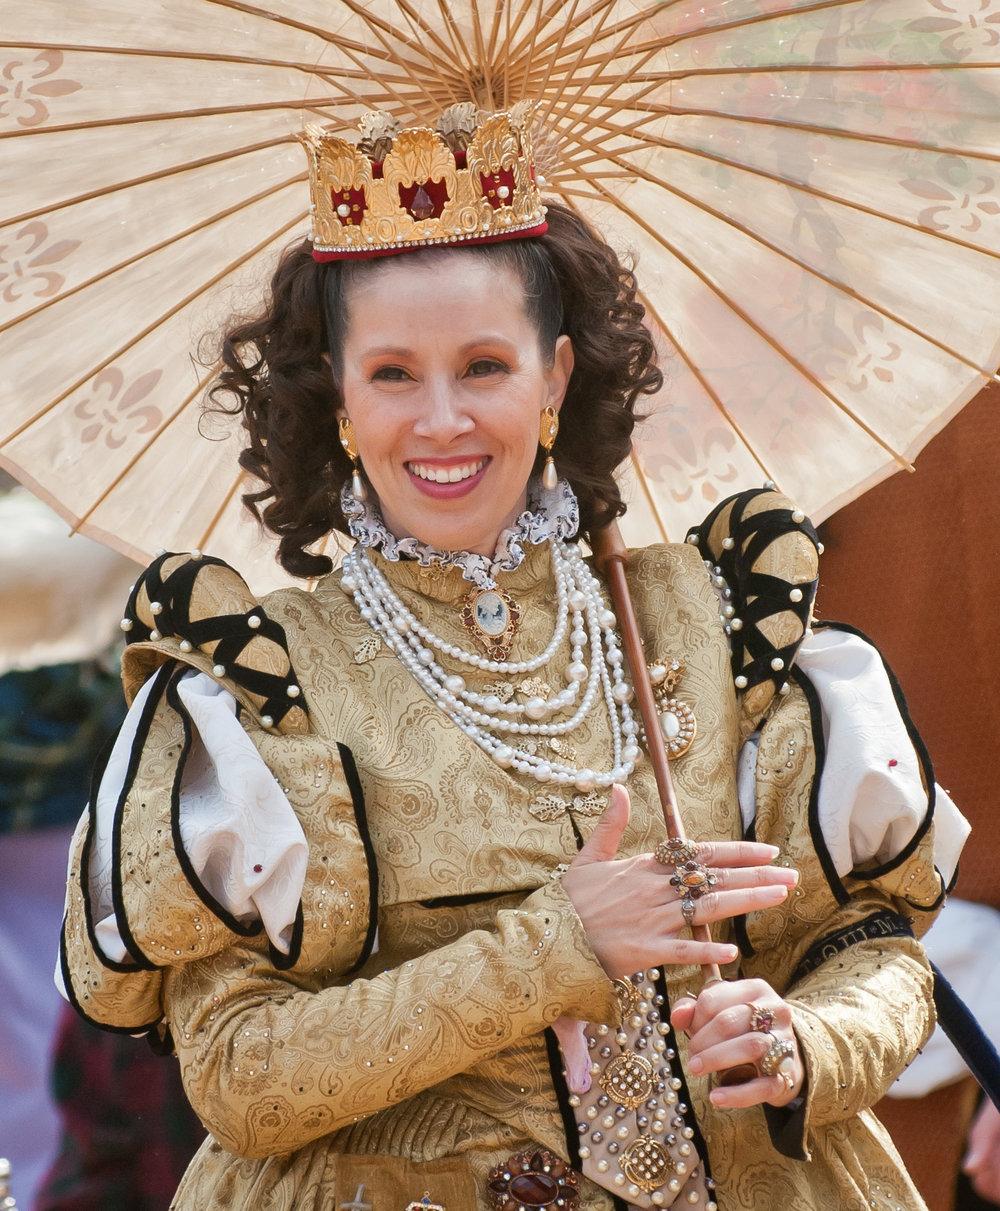 Her Majesty Queen Isabella